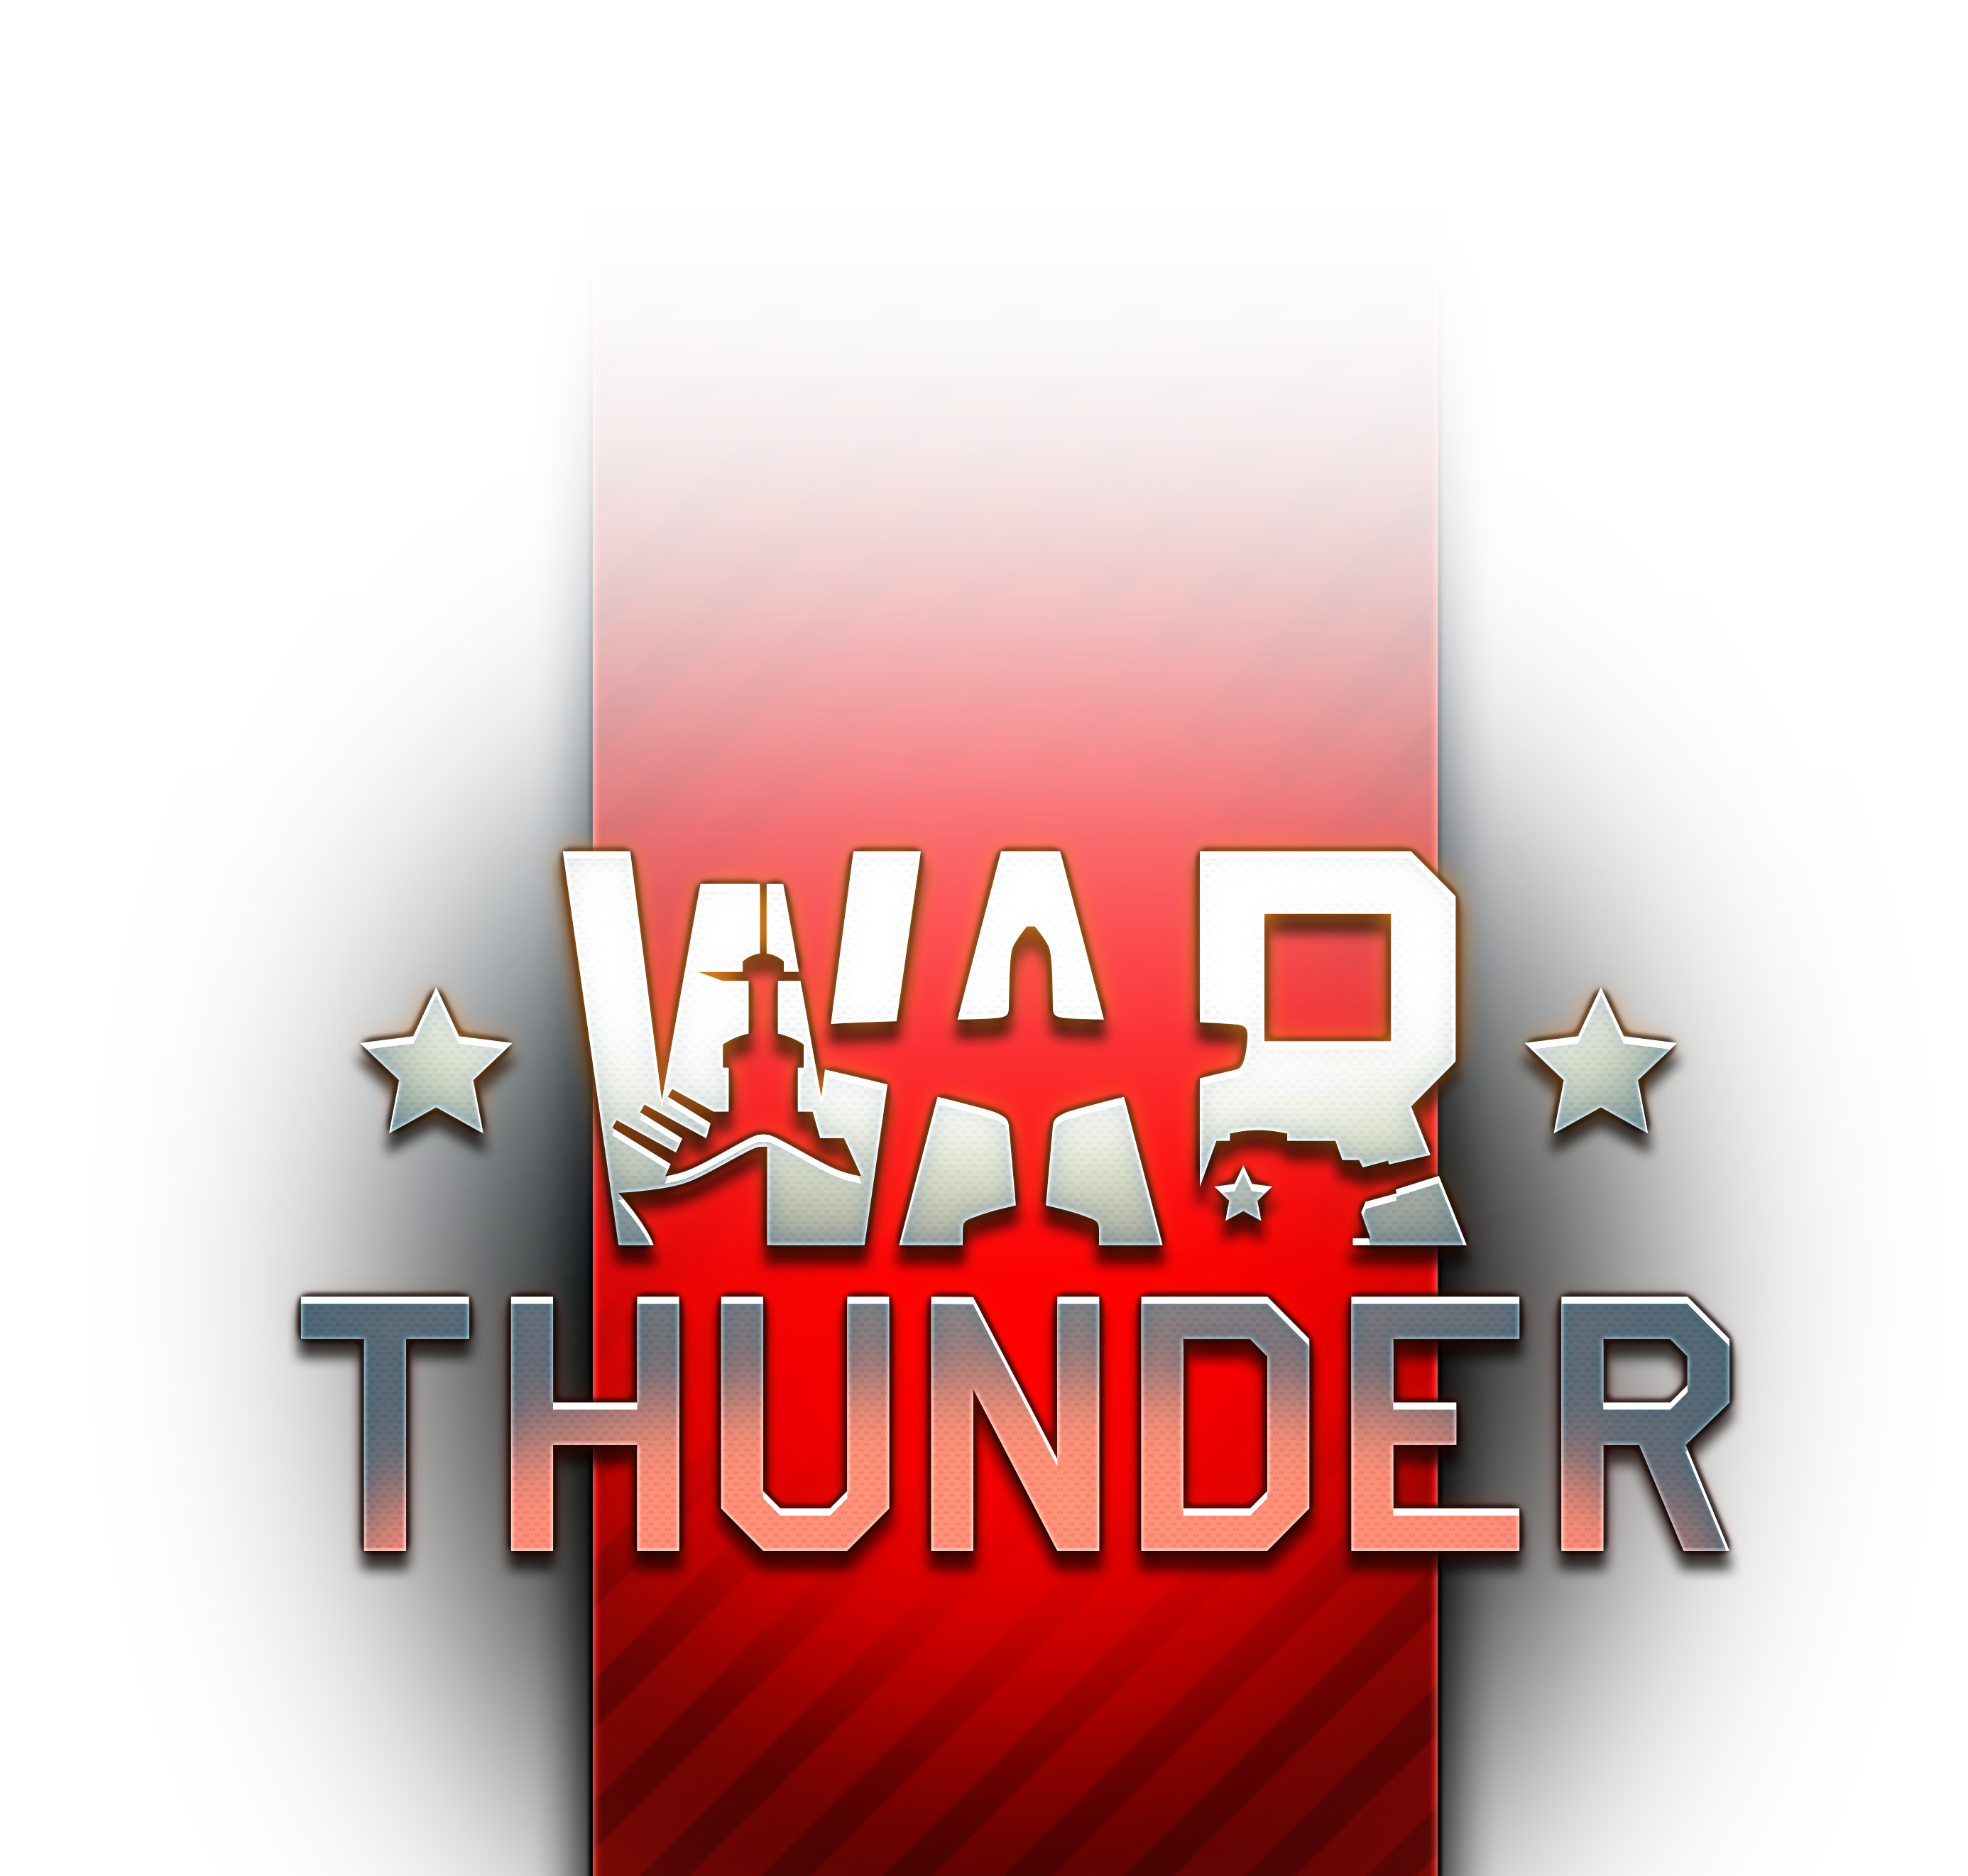 war thunder symbol